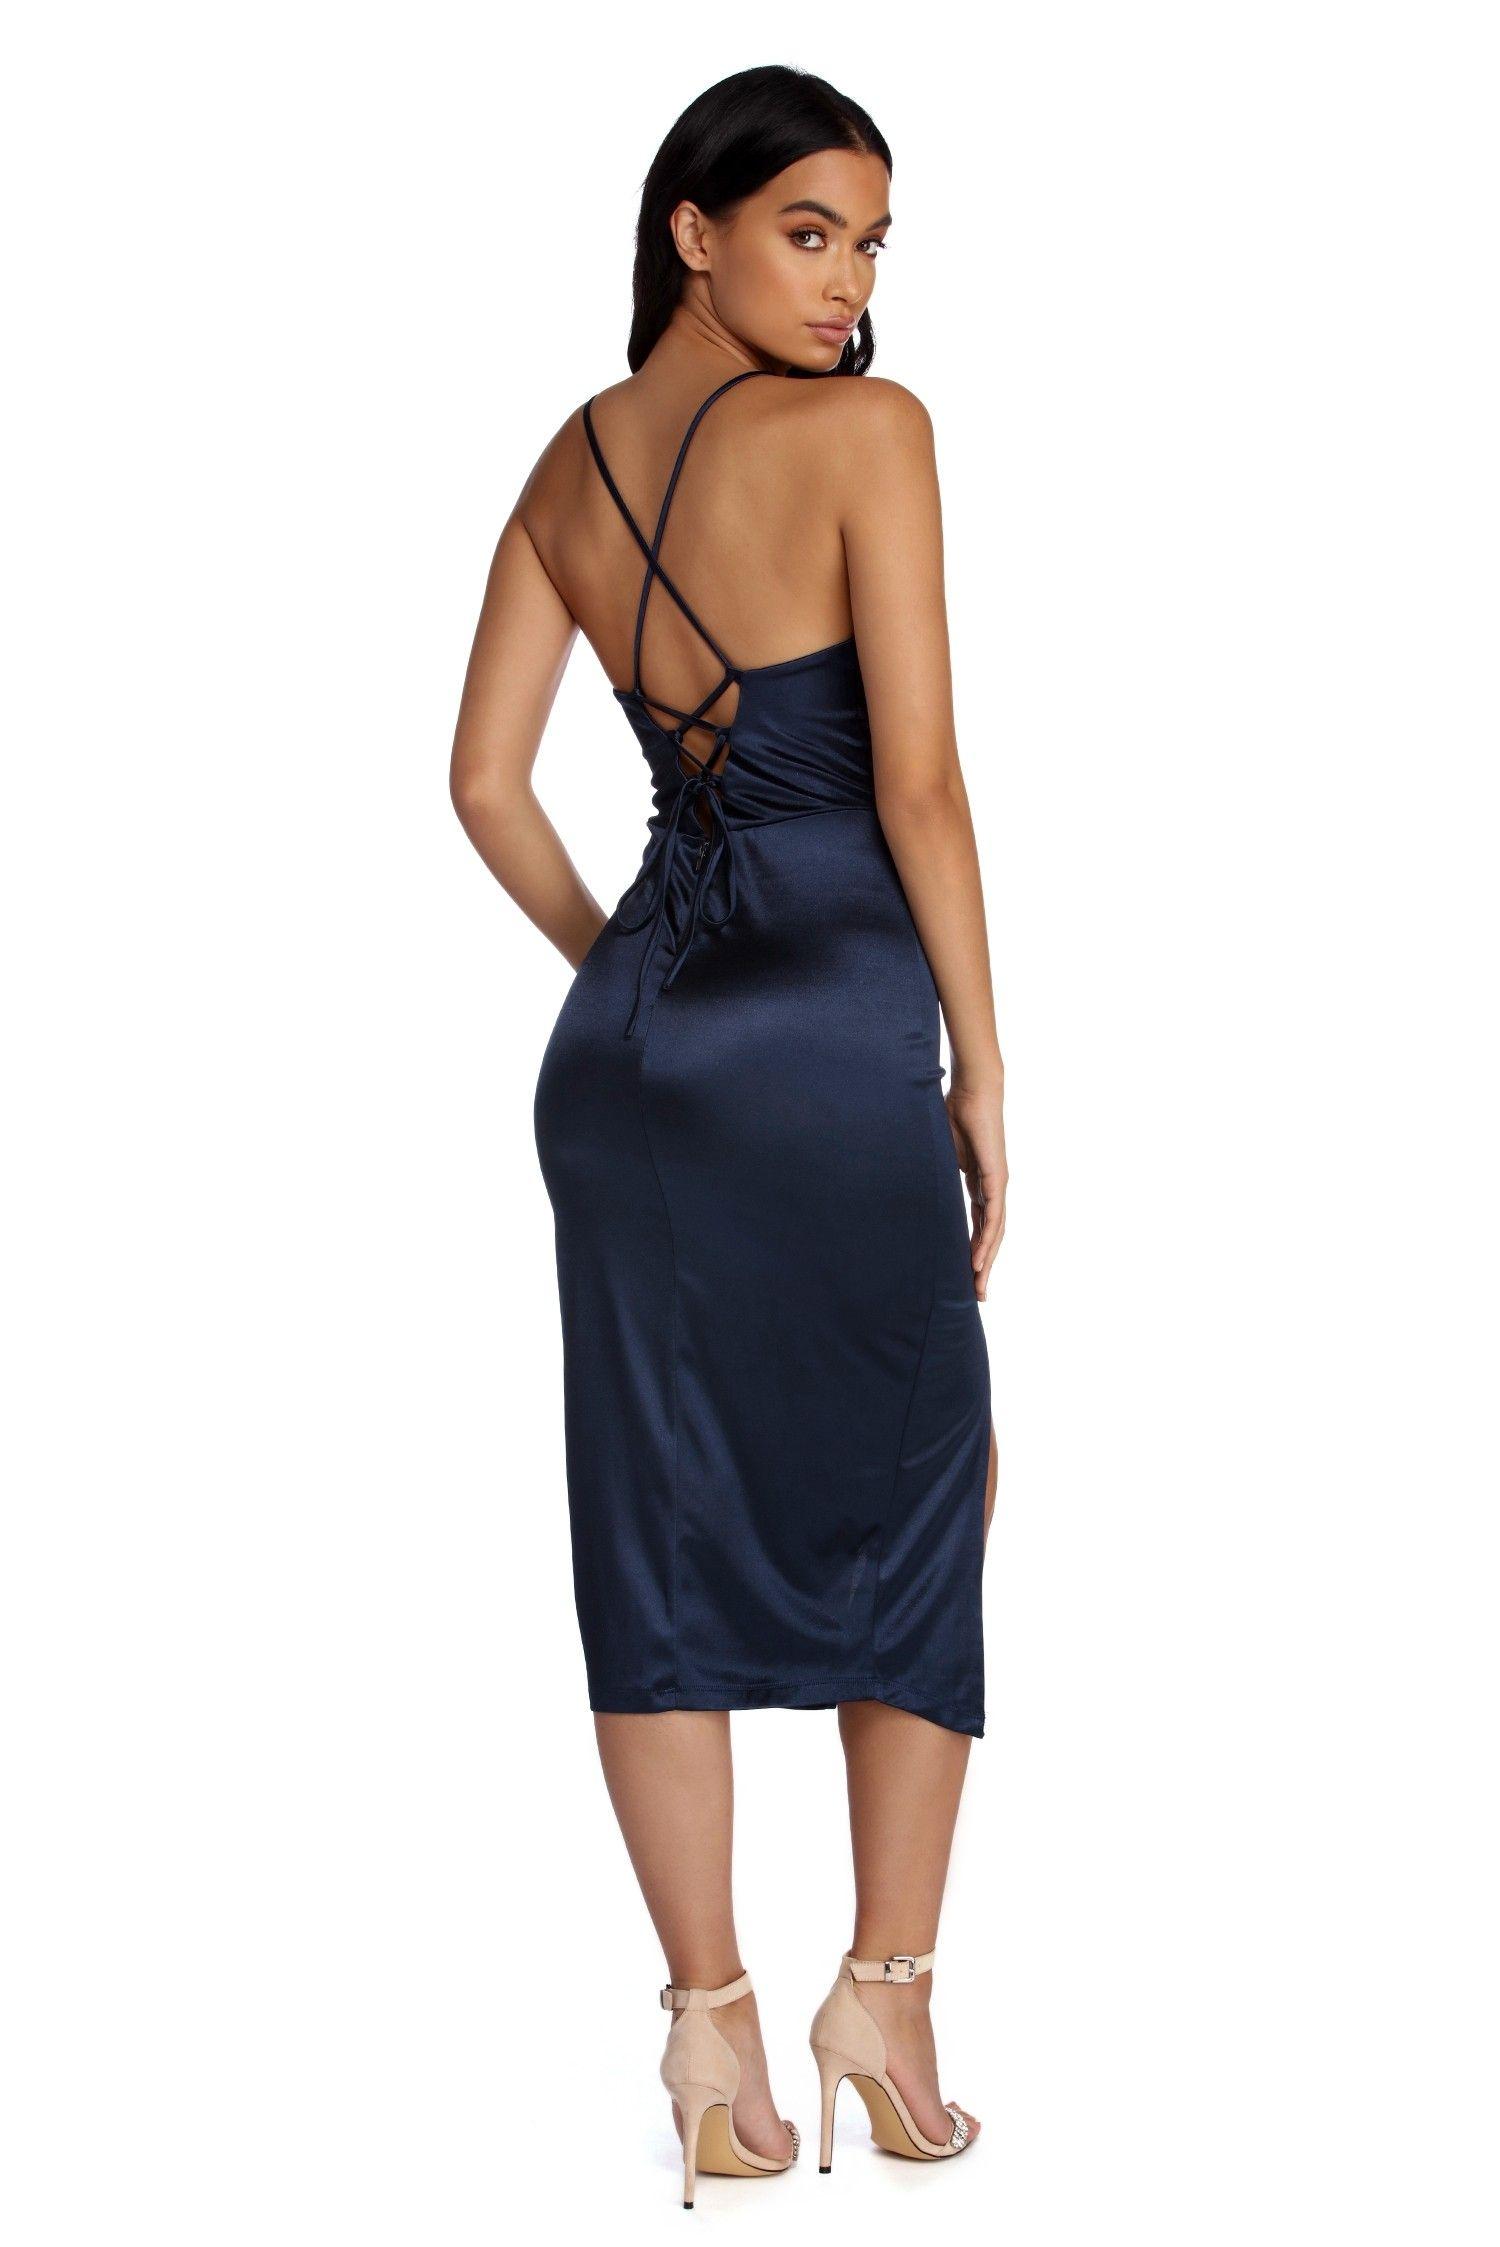 f7bd8aa2c6 Kenzie Navy Blue Formal Lattice Midi Dress Kenzie Formal Lattice Midi Dress  Navy Blue Dresses,